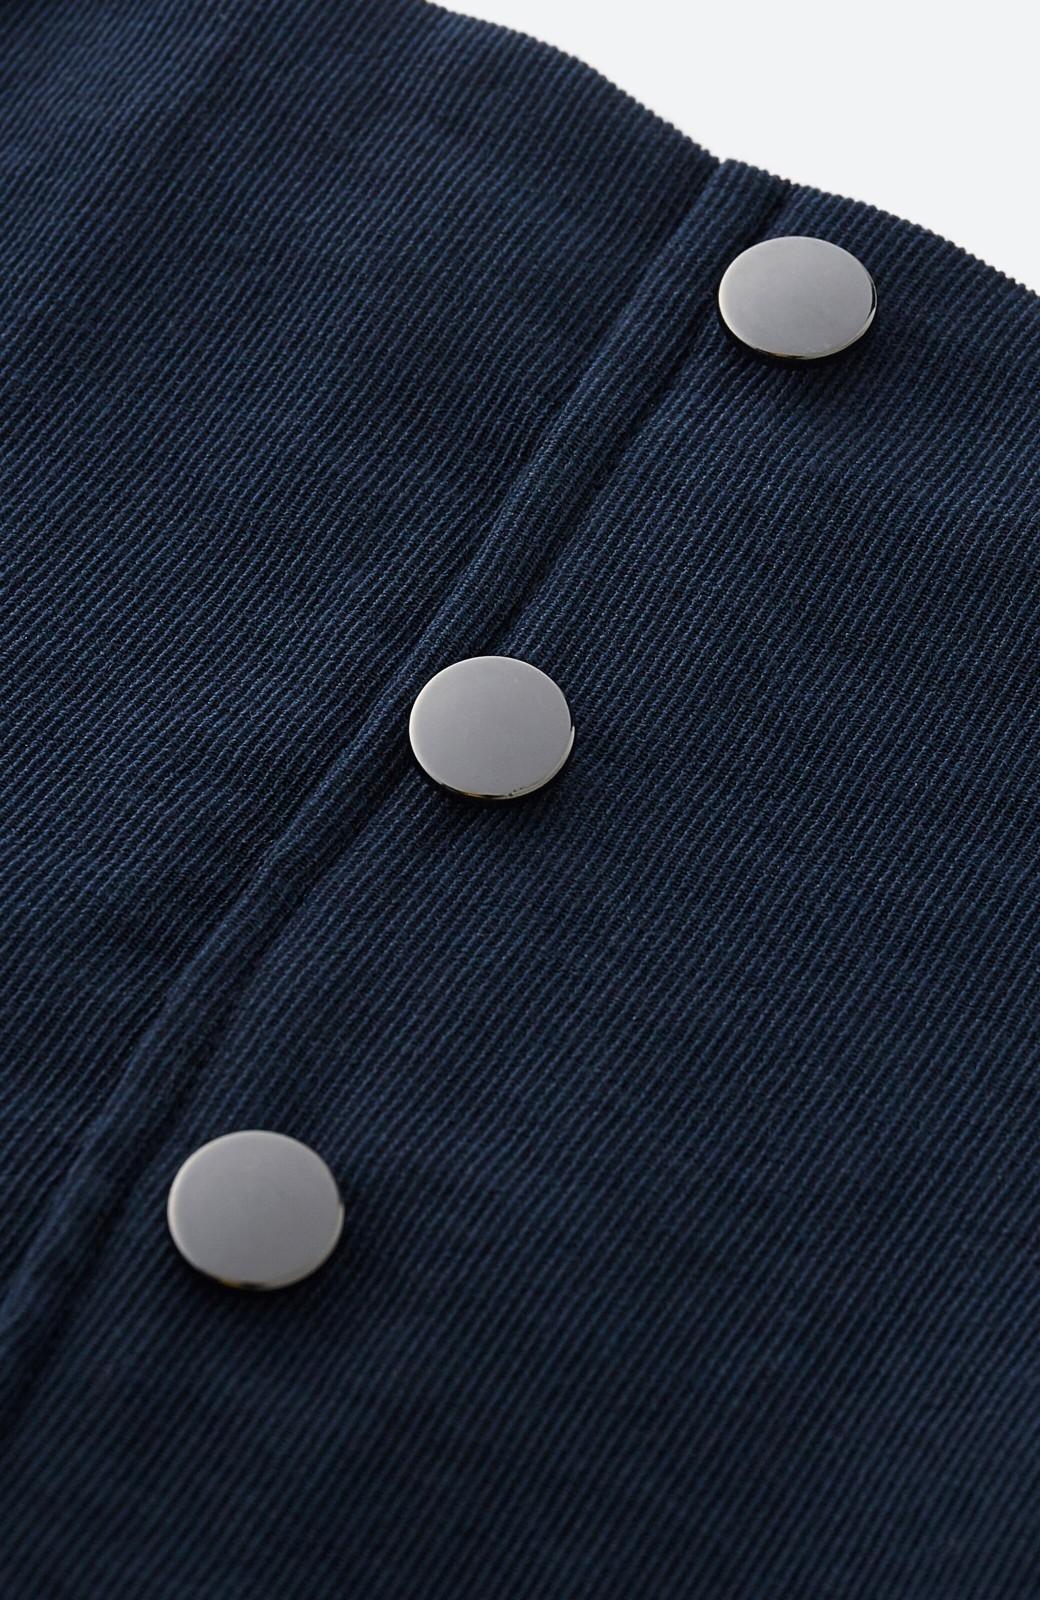 haco!  腹巻きとは呼ばせない ブルー期も華やかに過ごせる消臭加工裏地付きフリルデザインスカートセット【ブルー期】女の子バンザイ!プロジェクト <ネイビー>の商品写真5